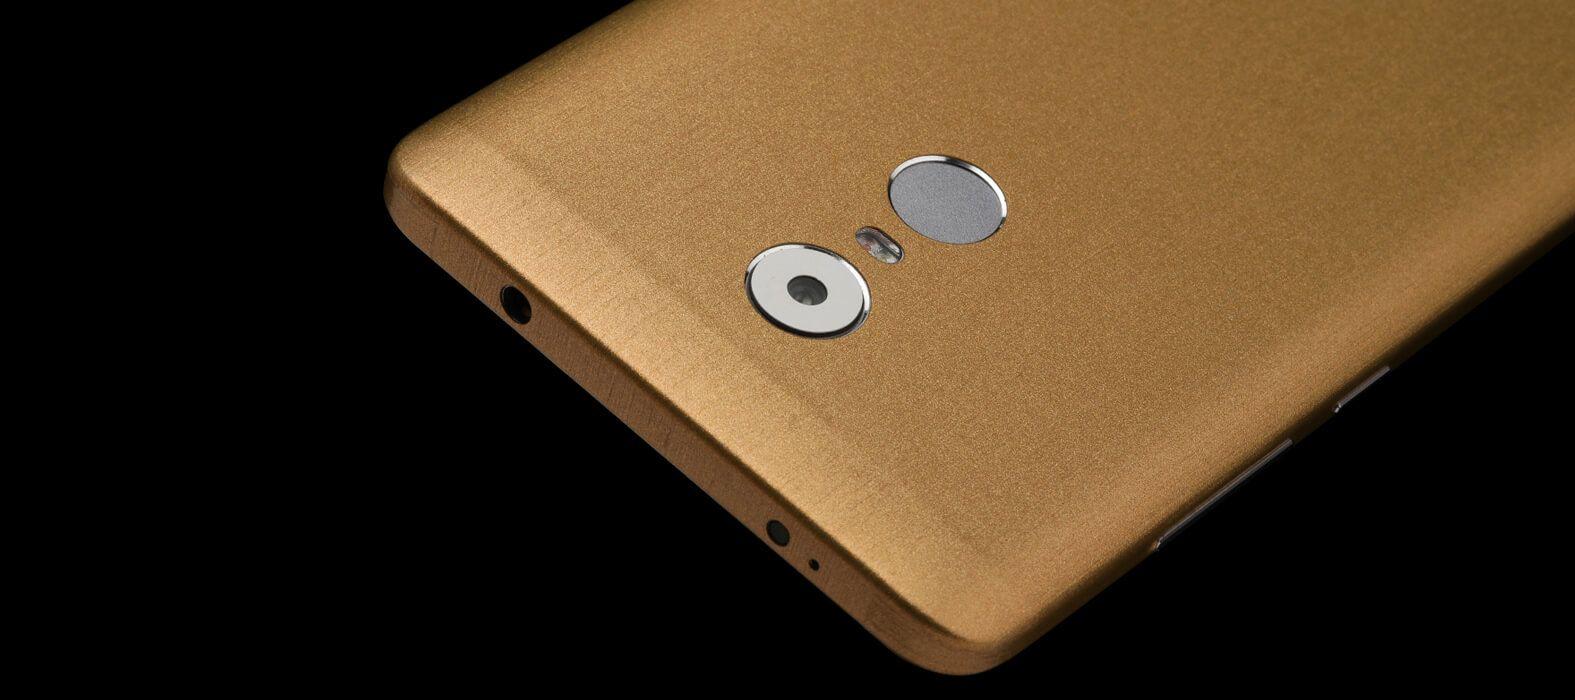 Brushed Gold Redmi Note 4 Wraps & Skins